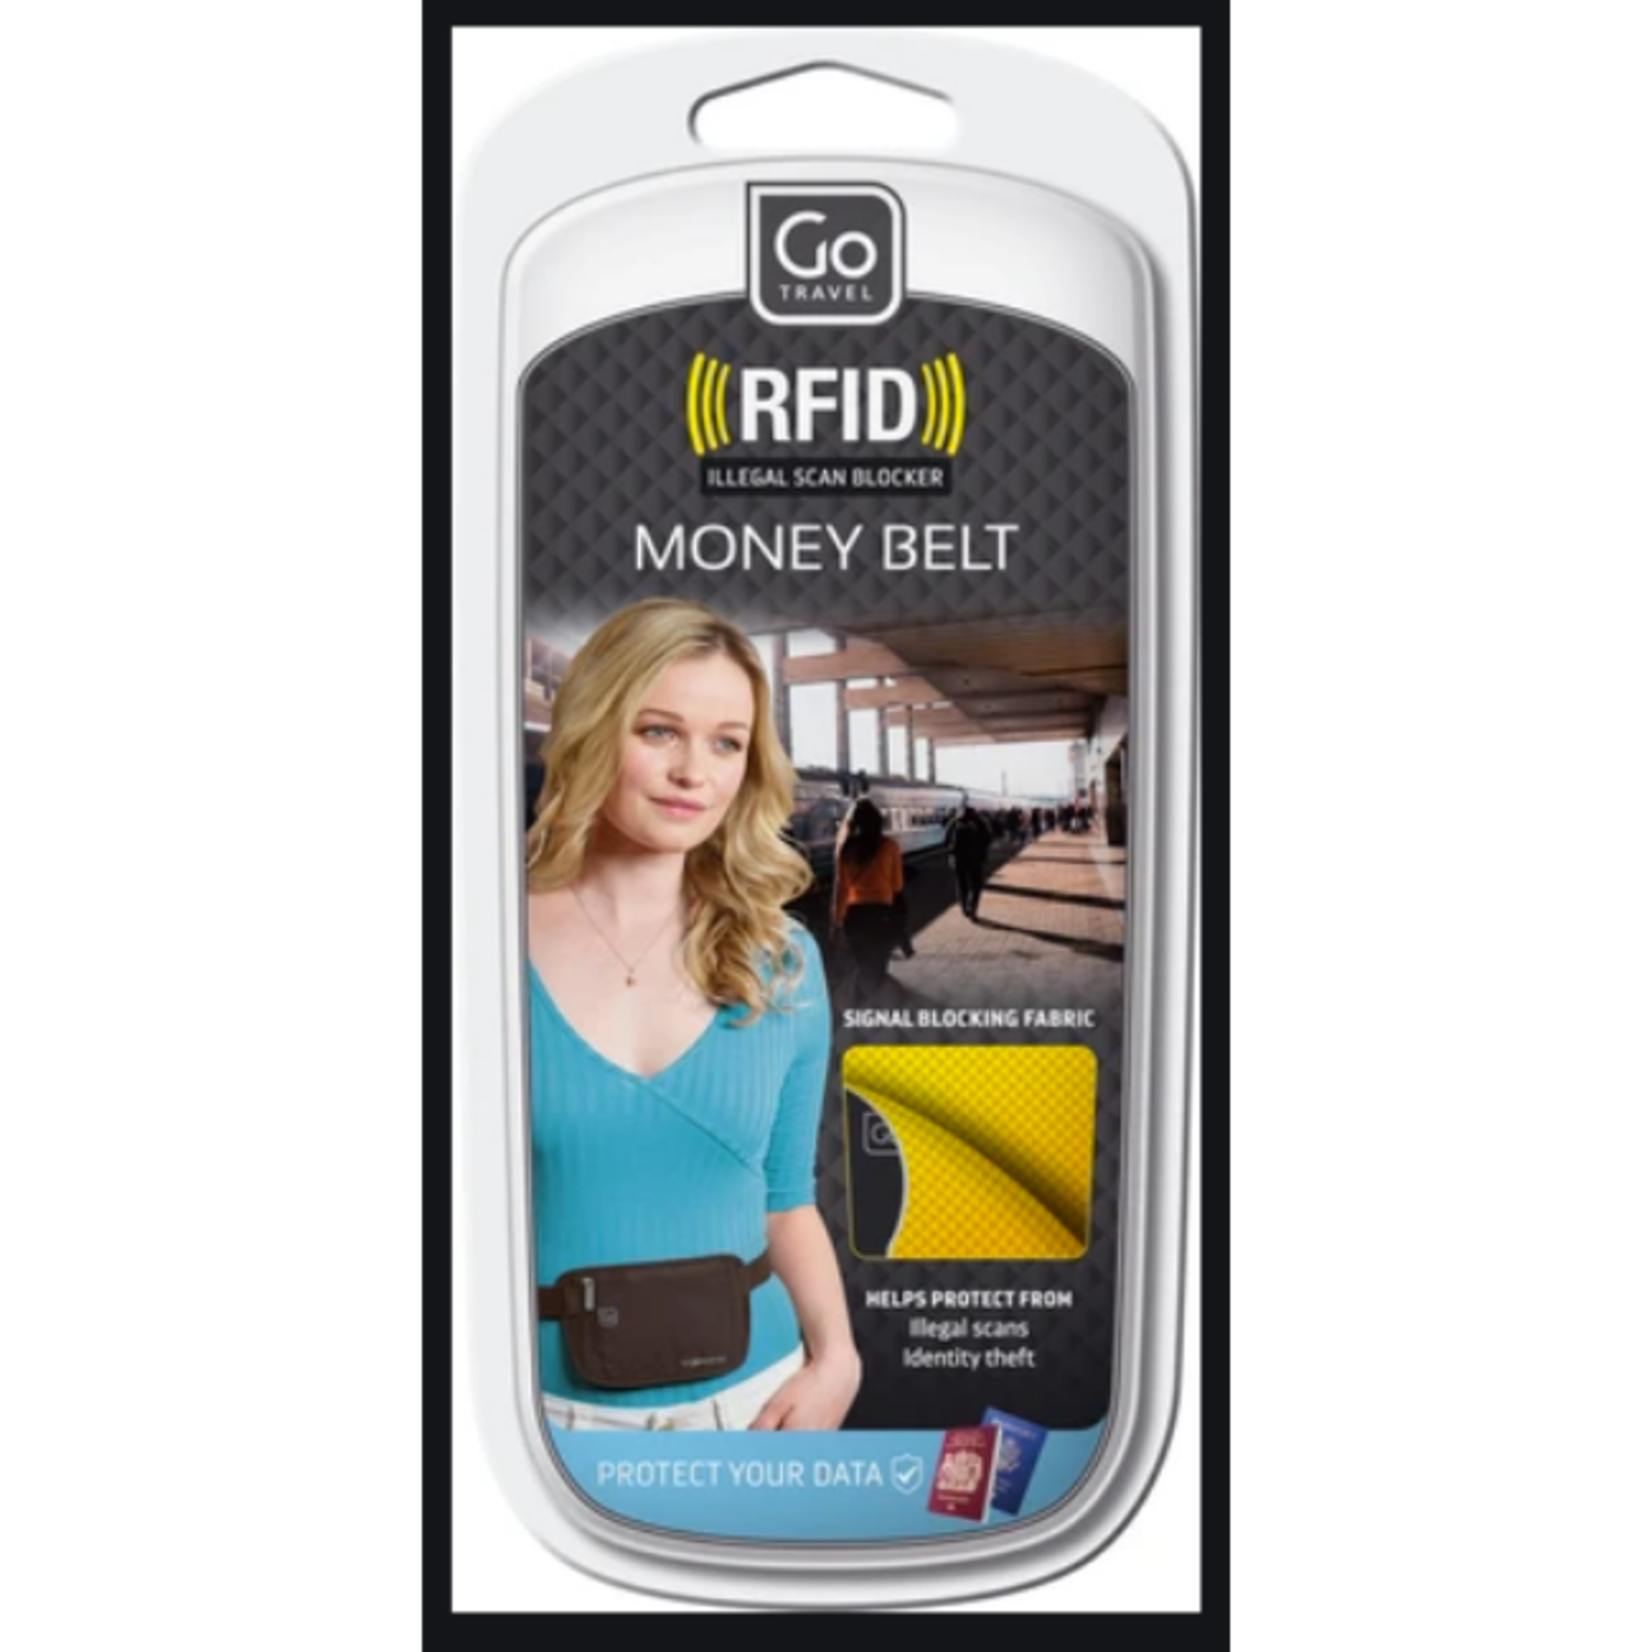 GO TRAVEL GO TRAVEL RFID MONEY BELT